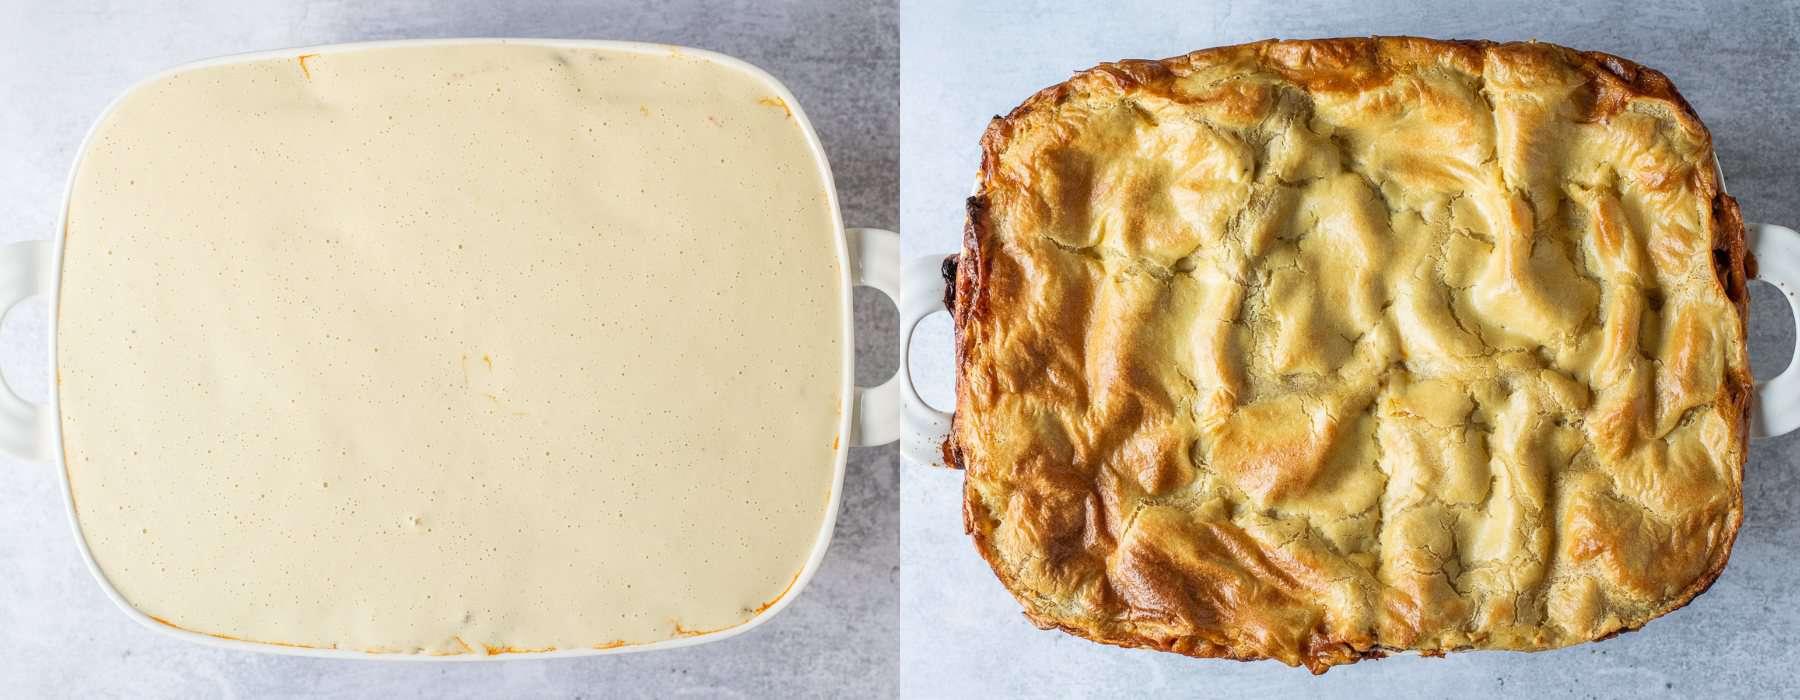 step 7 - cooking the lasagna